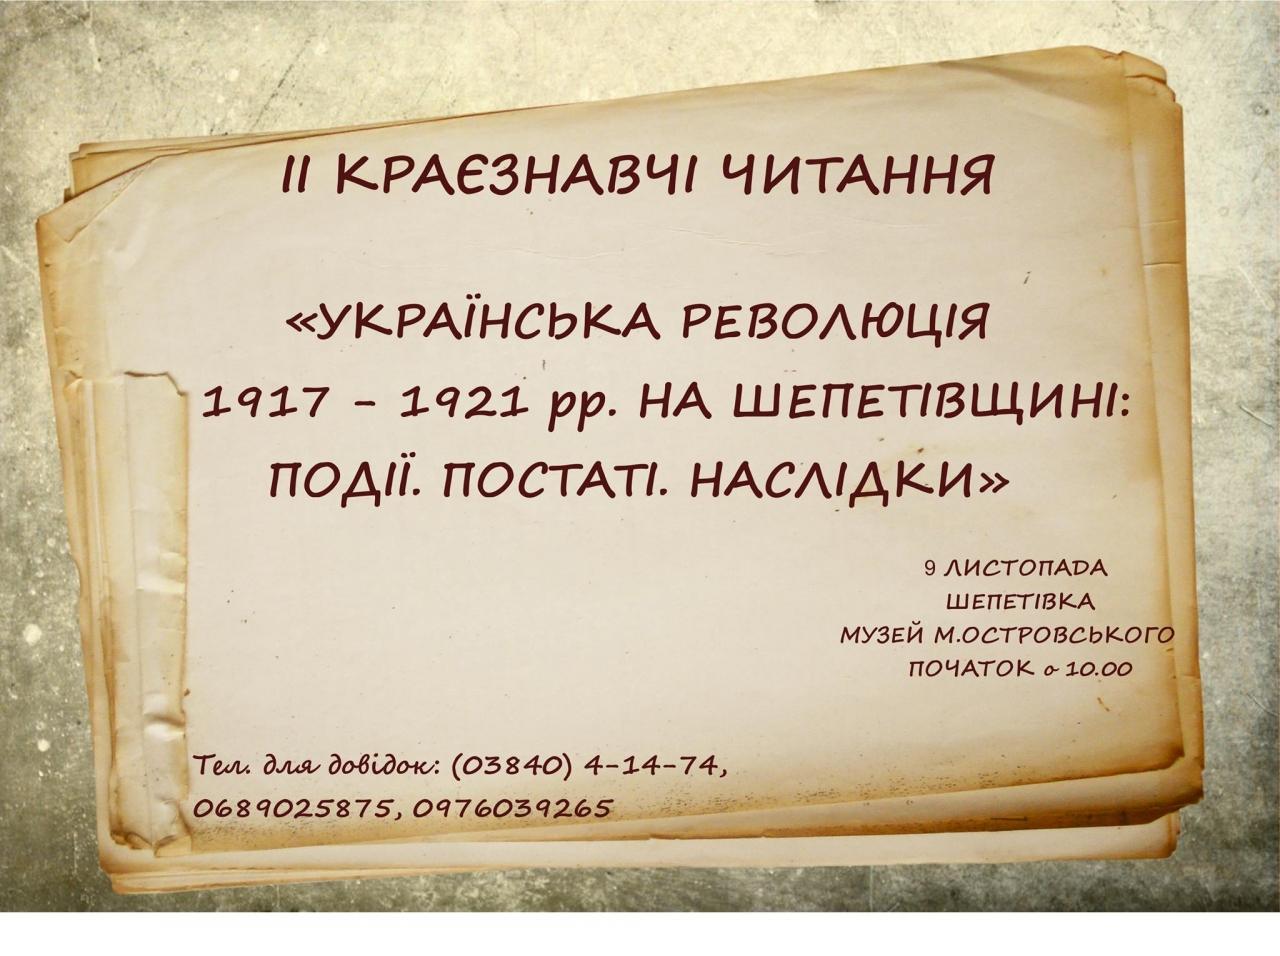 22712202_826751474171055_4768020370713534822_o